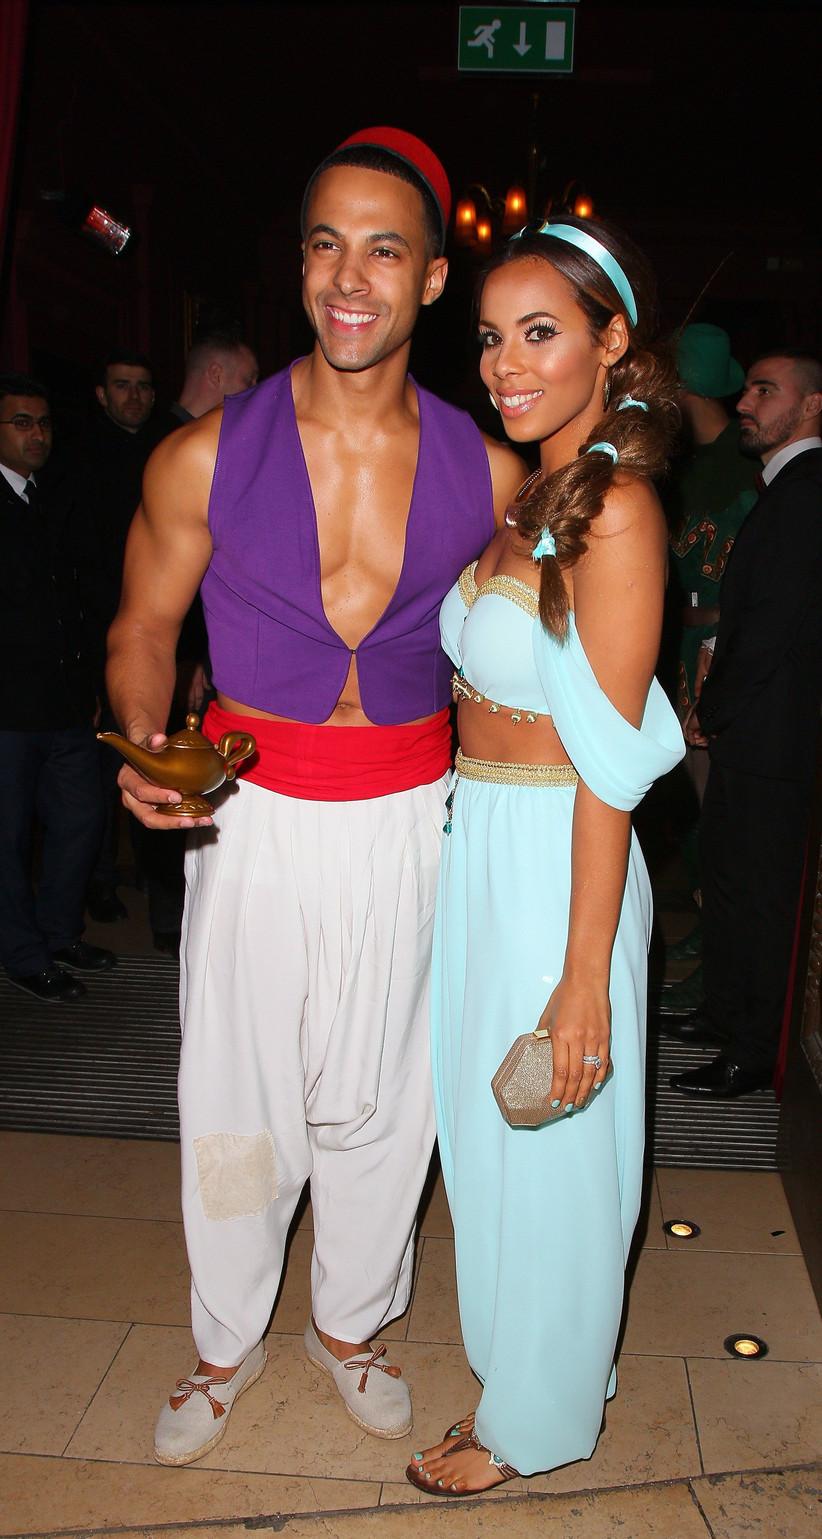 Couples Halloween Costume Aladdin and Princess Jasmine